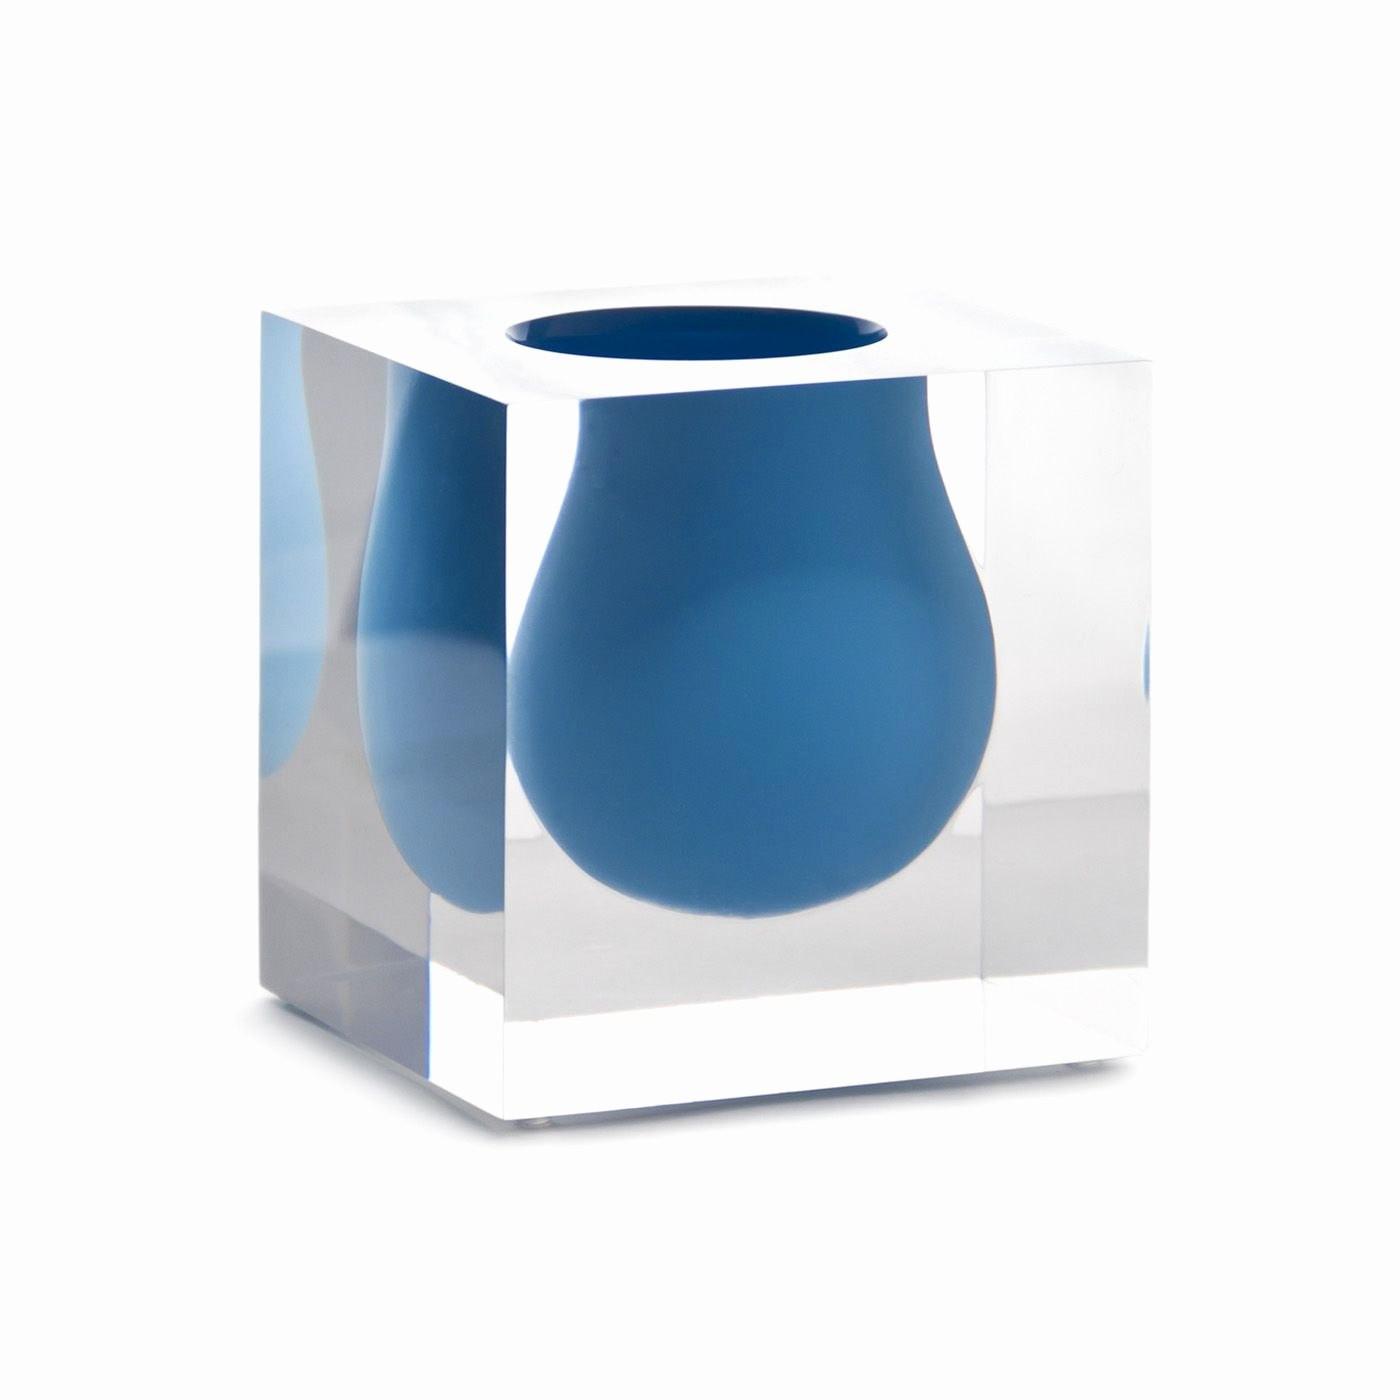 20 inch clear glass vase of 20 unique very tall decorative vases bogekompresorturkiye com intended for vases for home decor unique home decor vases unique d dkbrw 5743 1h vases tall wood